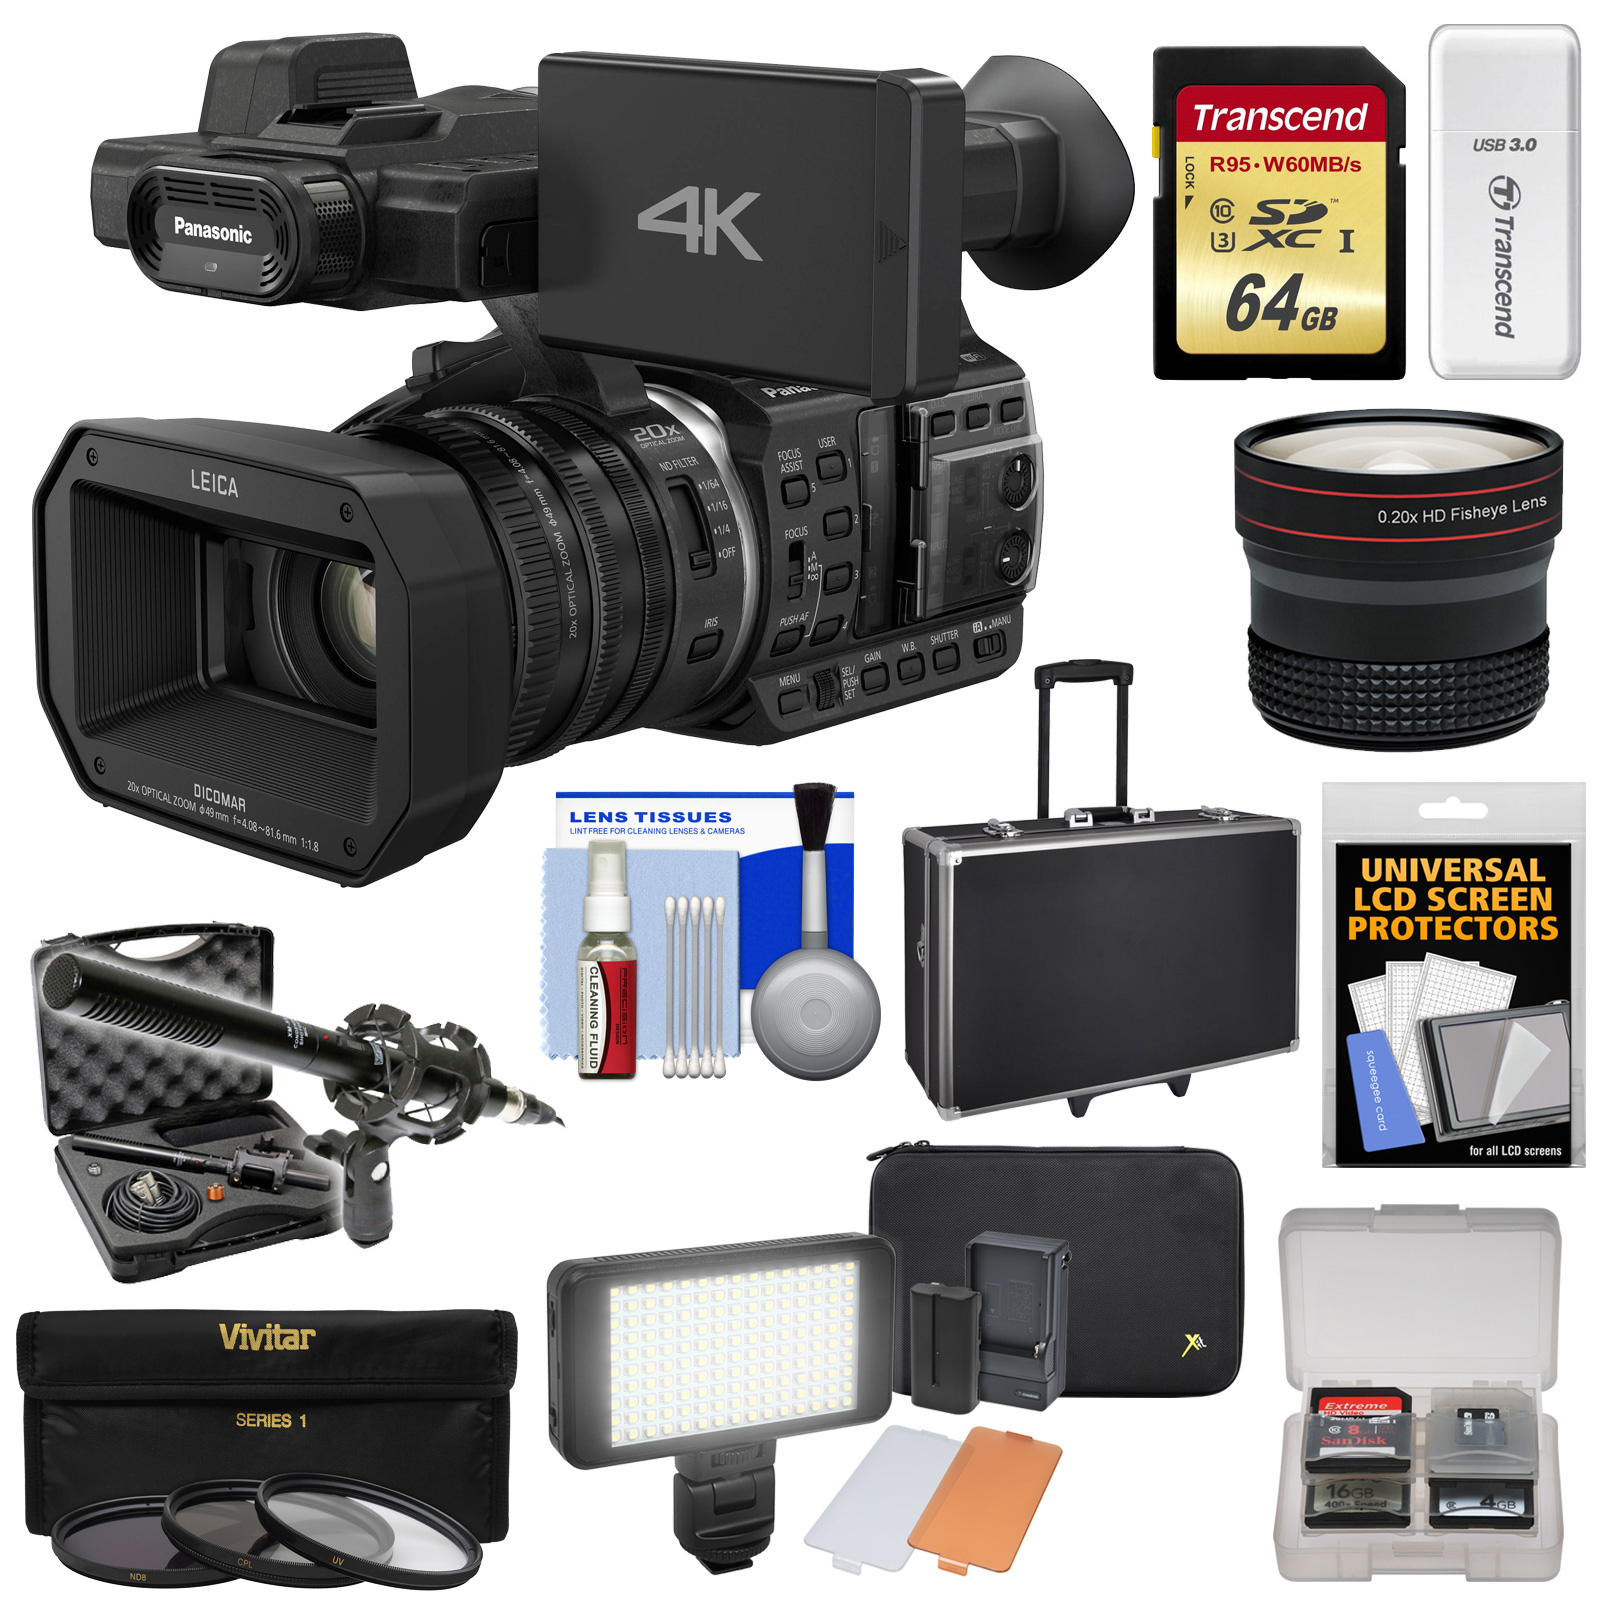 Panasonic HC-X1000 4K Ultra HD Wi-Fi Video Camera Camcorder with Fisheye Lens + 64GB Card + Case + LED Light Set + Microphone Set + Accessory Kit